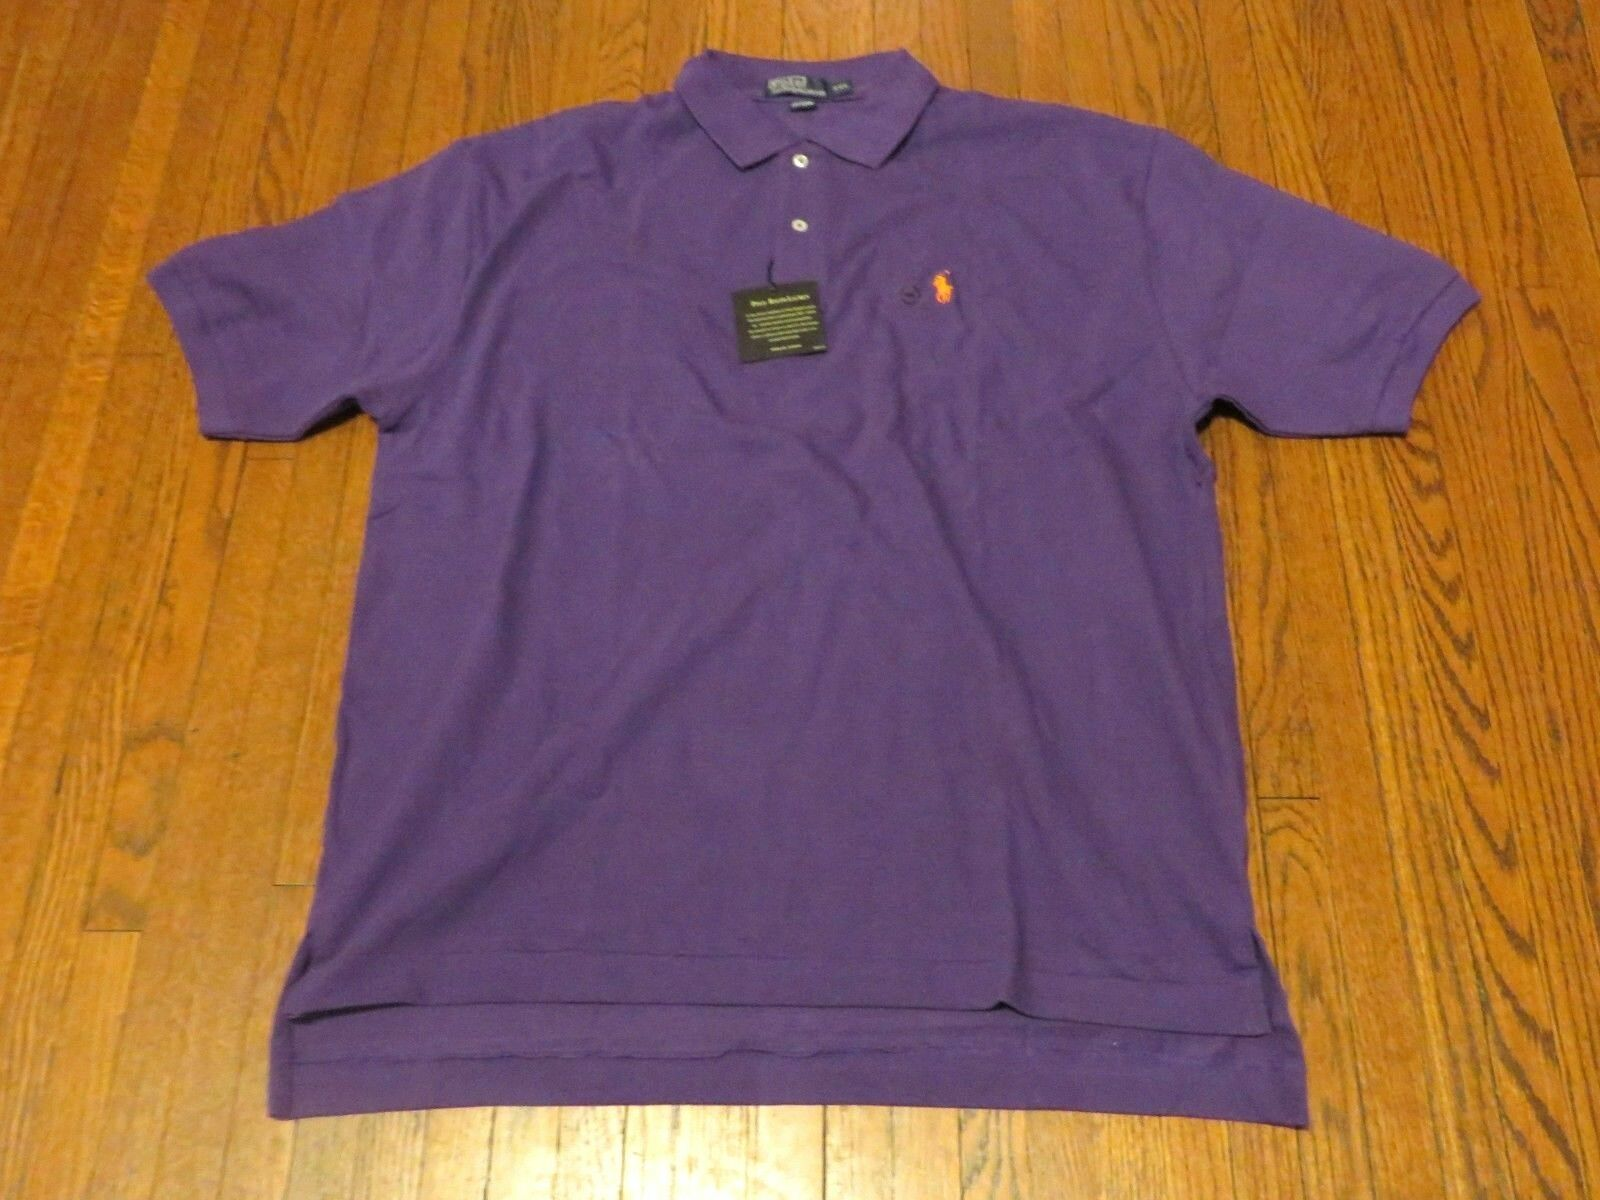 Men's NWT Polo Ralph Lauren The Mesh Shirt Purple Polo Shirt sz 2XL